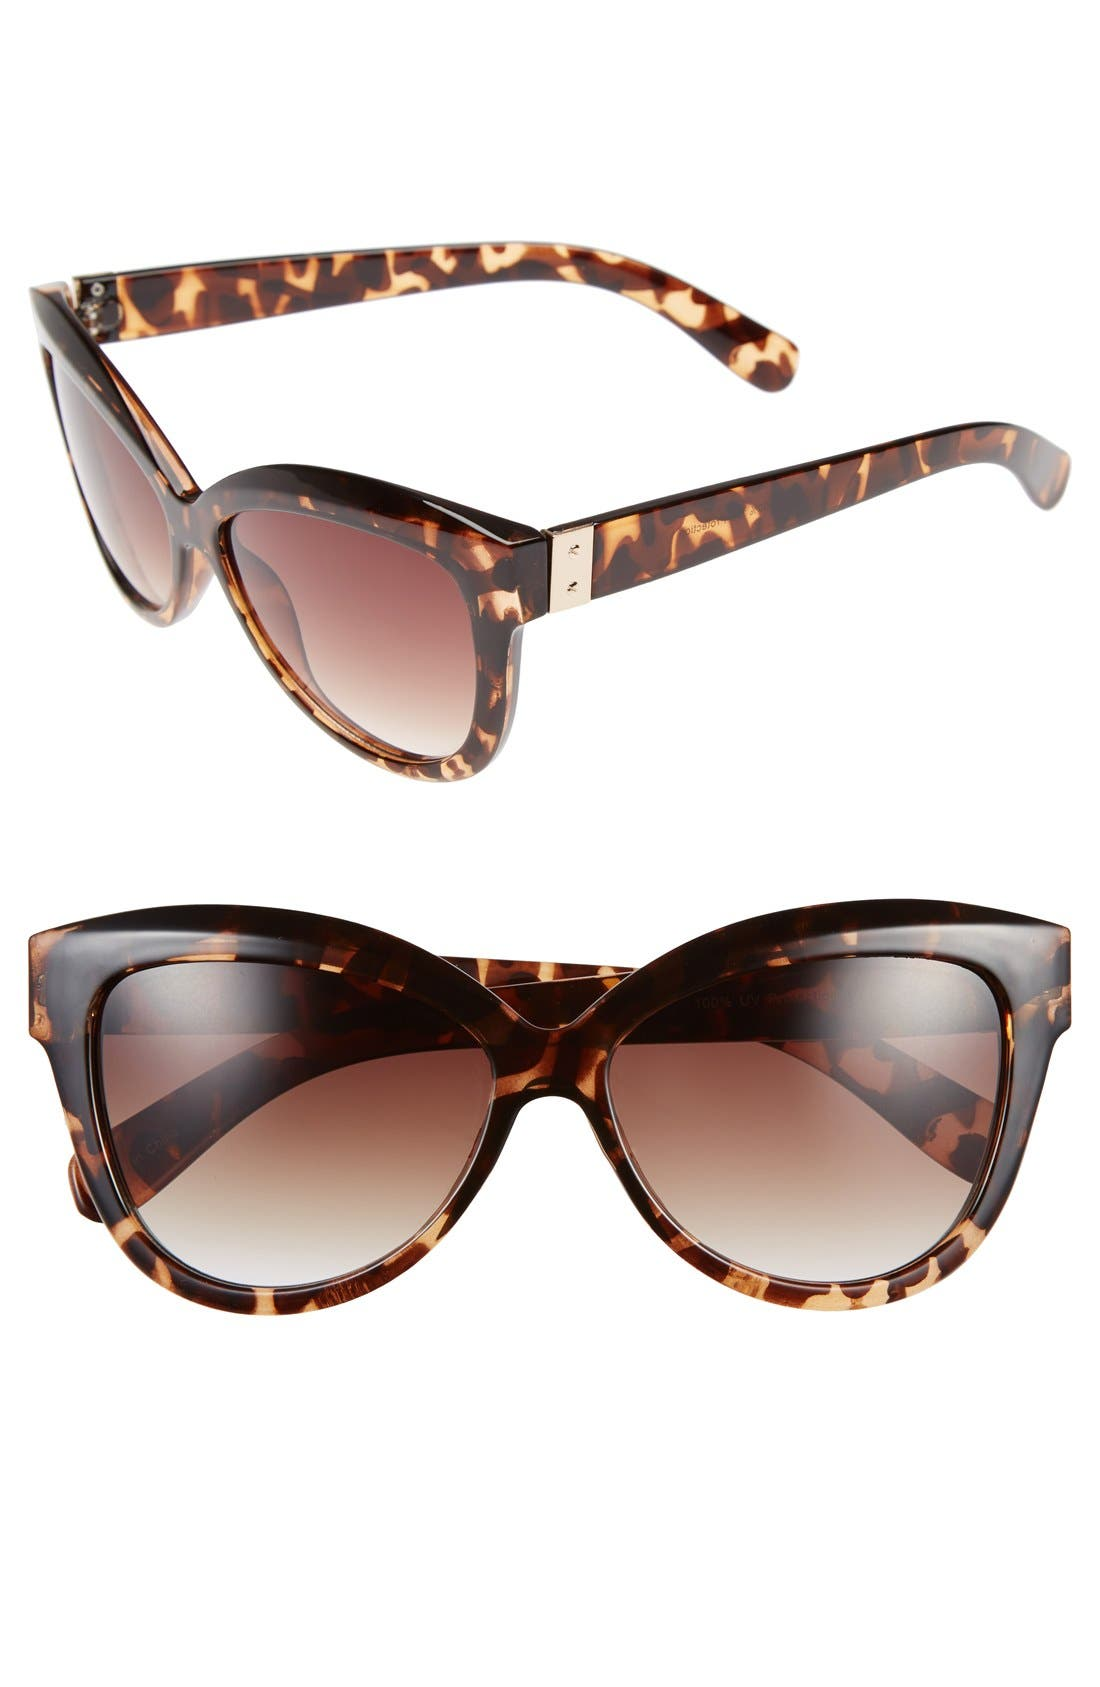 Alternate Image 1 Selected - BP. 60mm Round Sunglasses